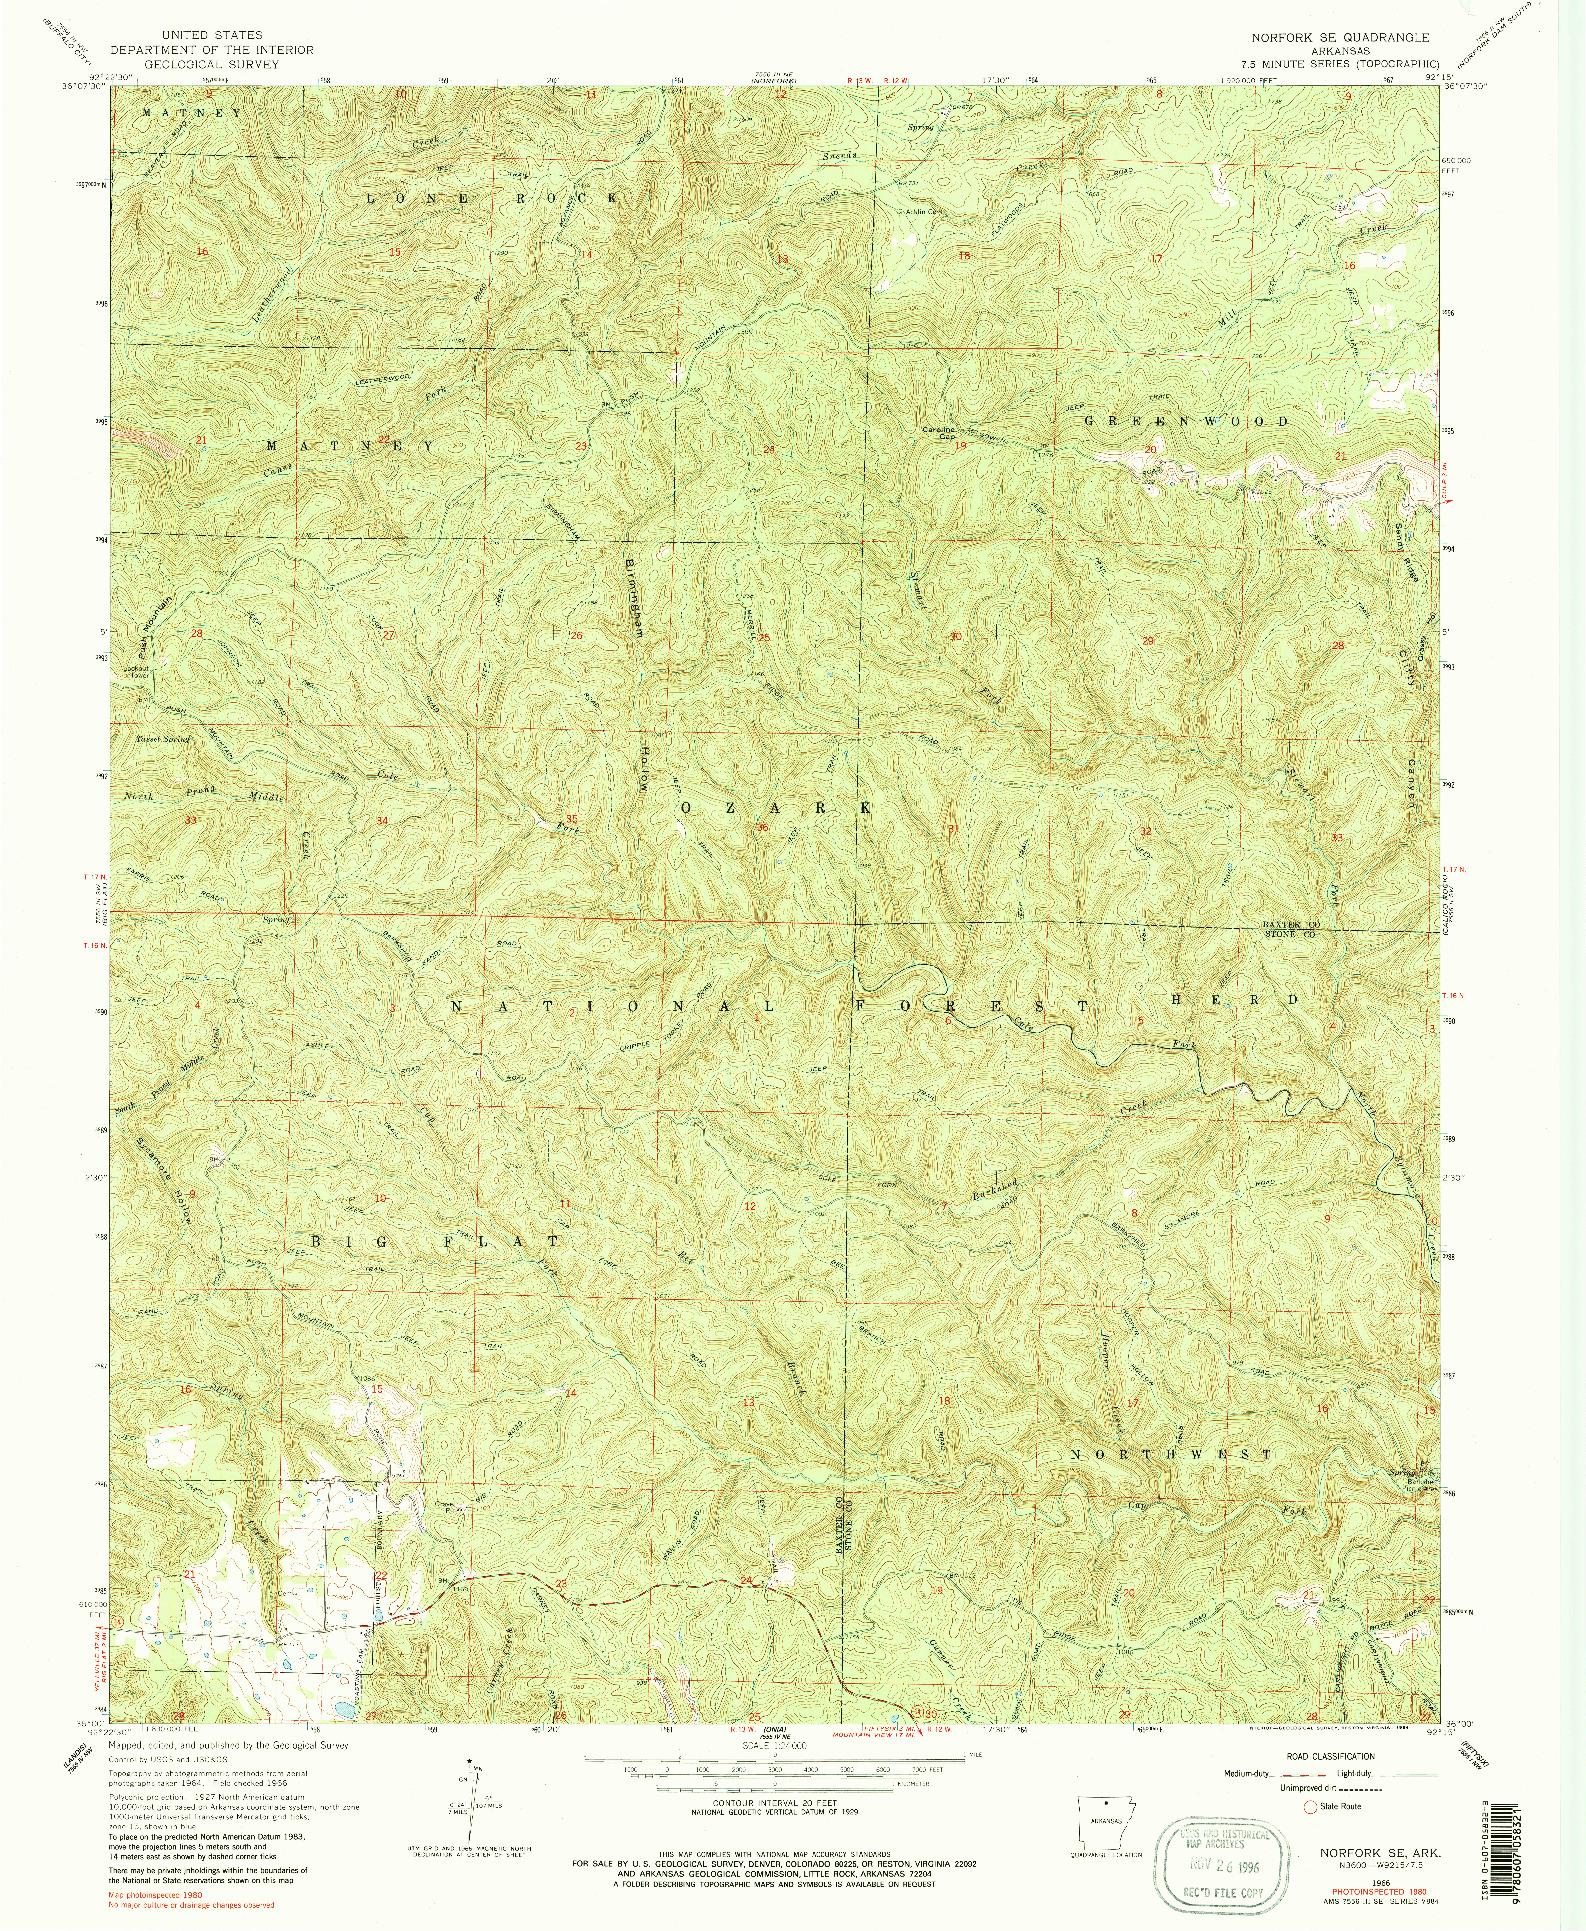 USGS 1:24000-SCALE QUADRANGLE FOR NORFORK SE, AR 1966